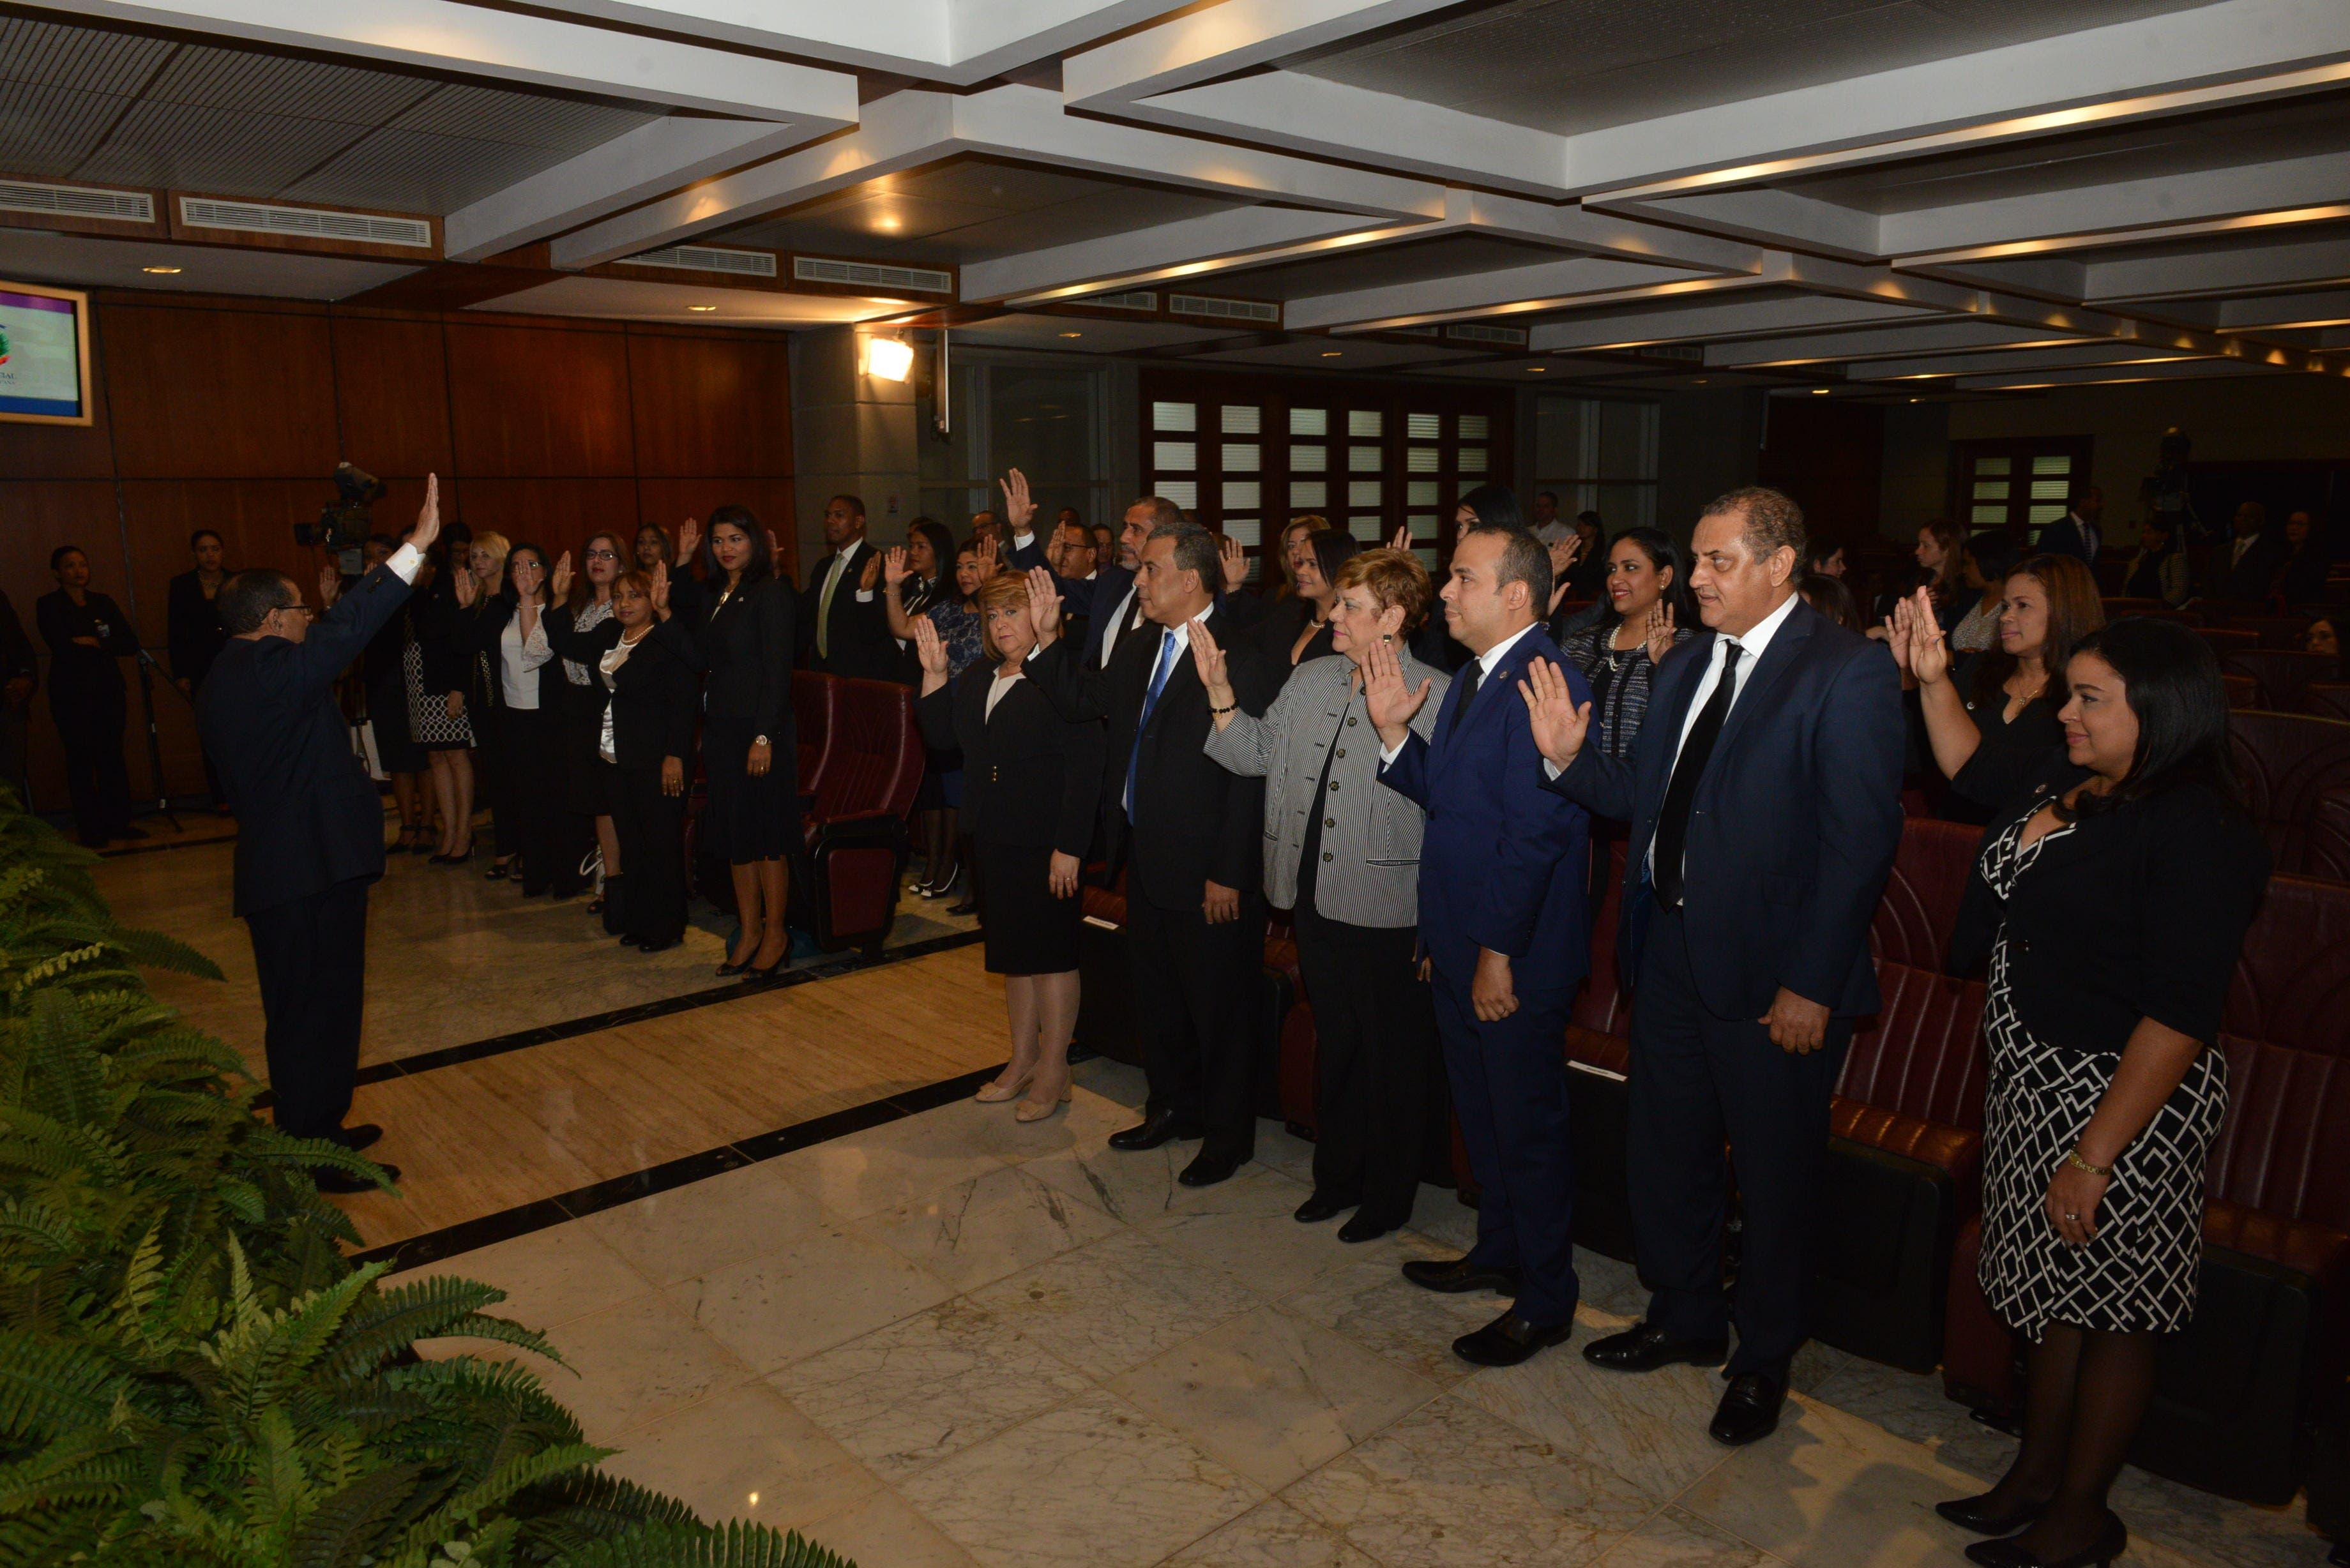 Mariano Germán Mejía juramenta a 31 jueces ascendidos